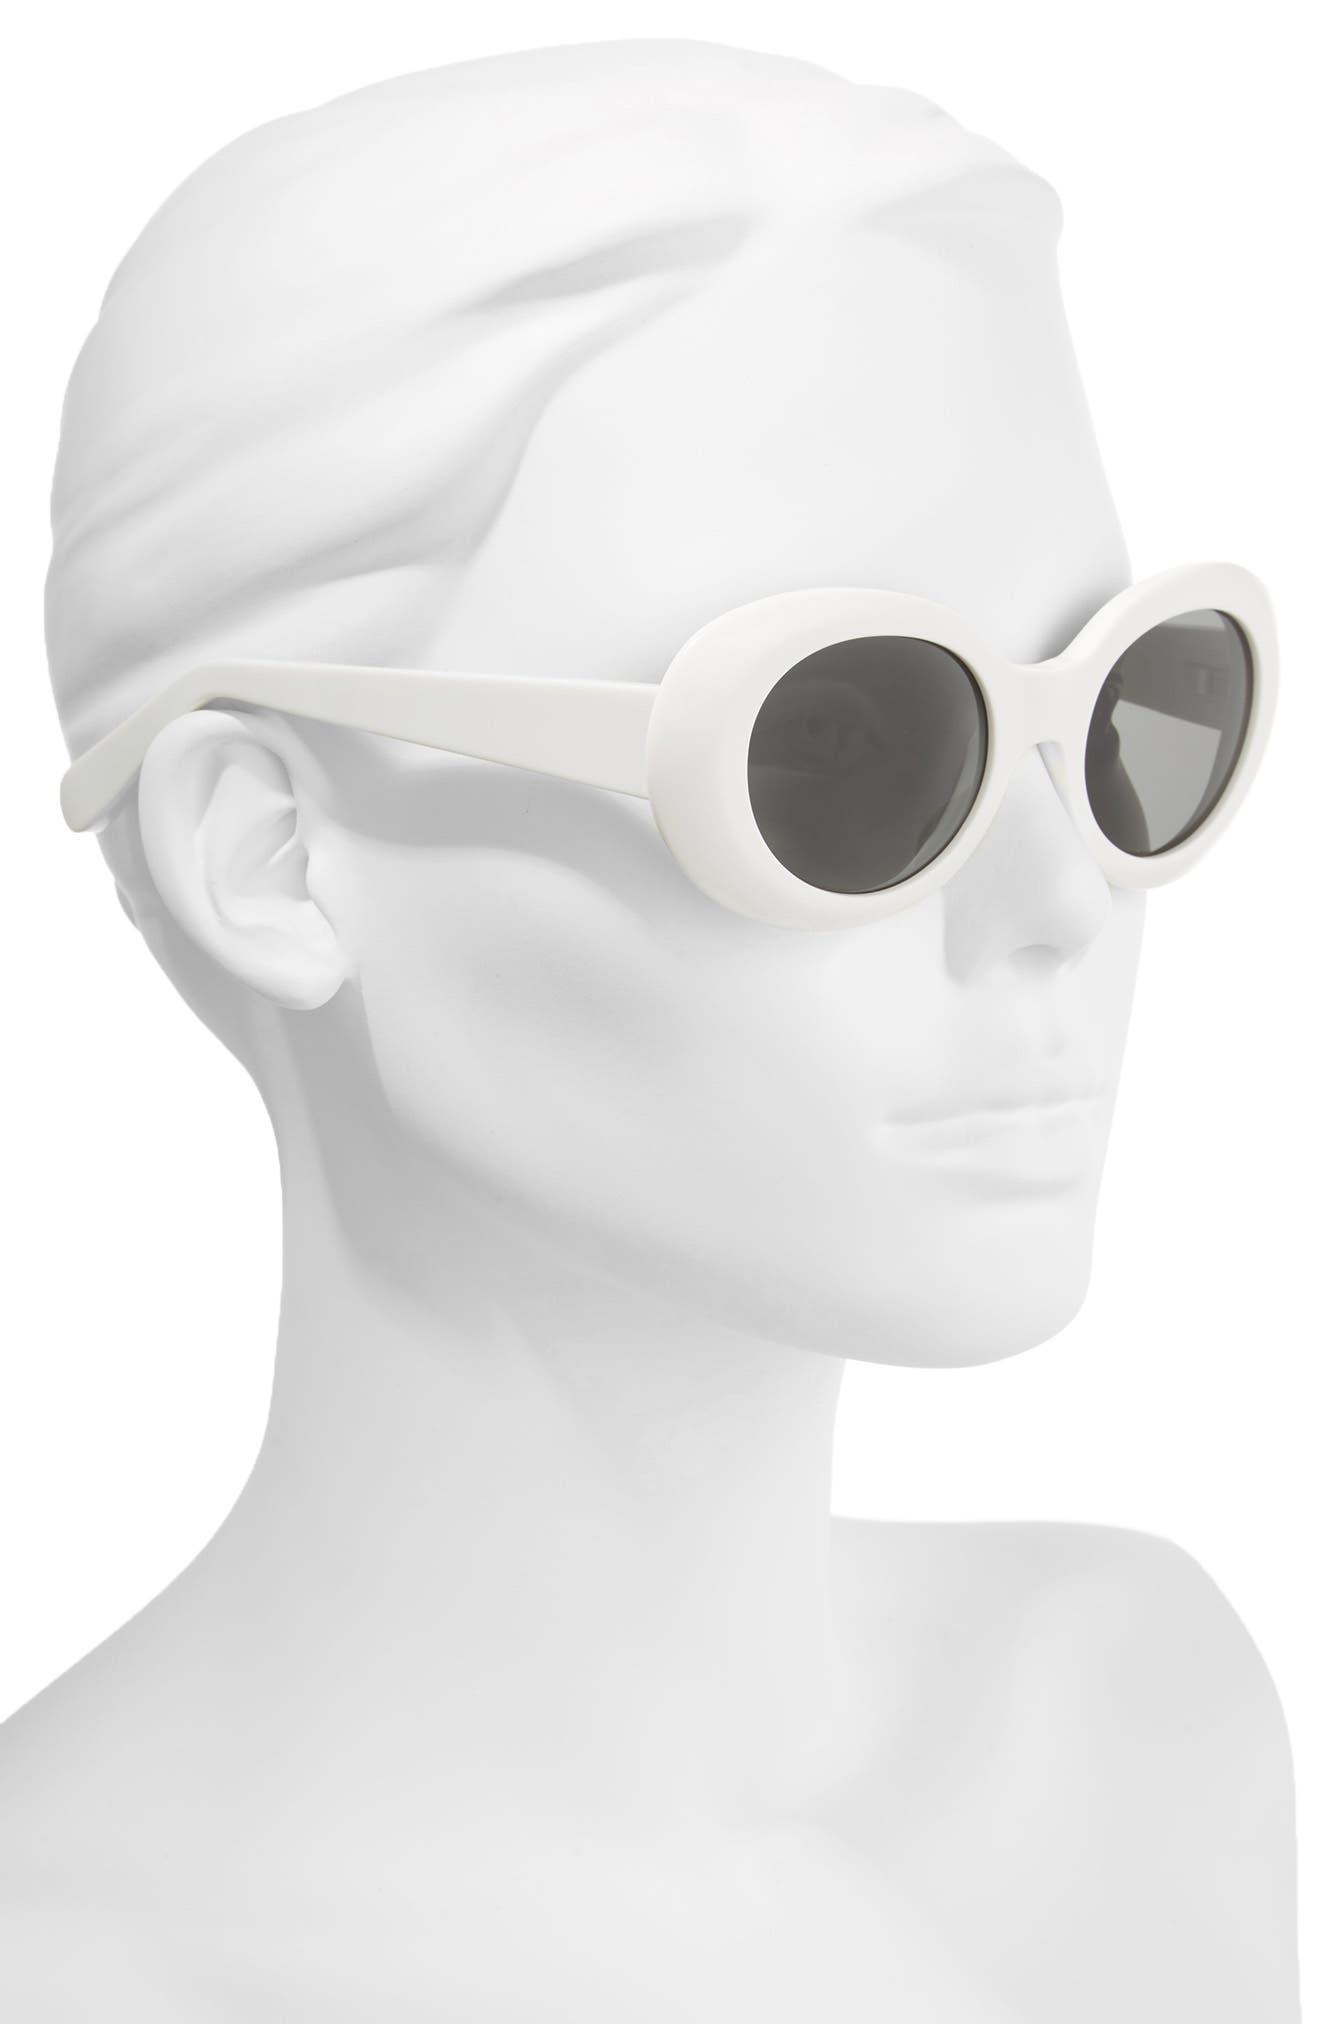 Mustang 48mm Sunglasses,                             Alternate thumbnail 2, color,                             Off White/ Black